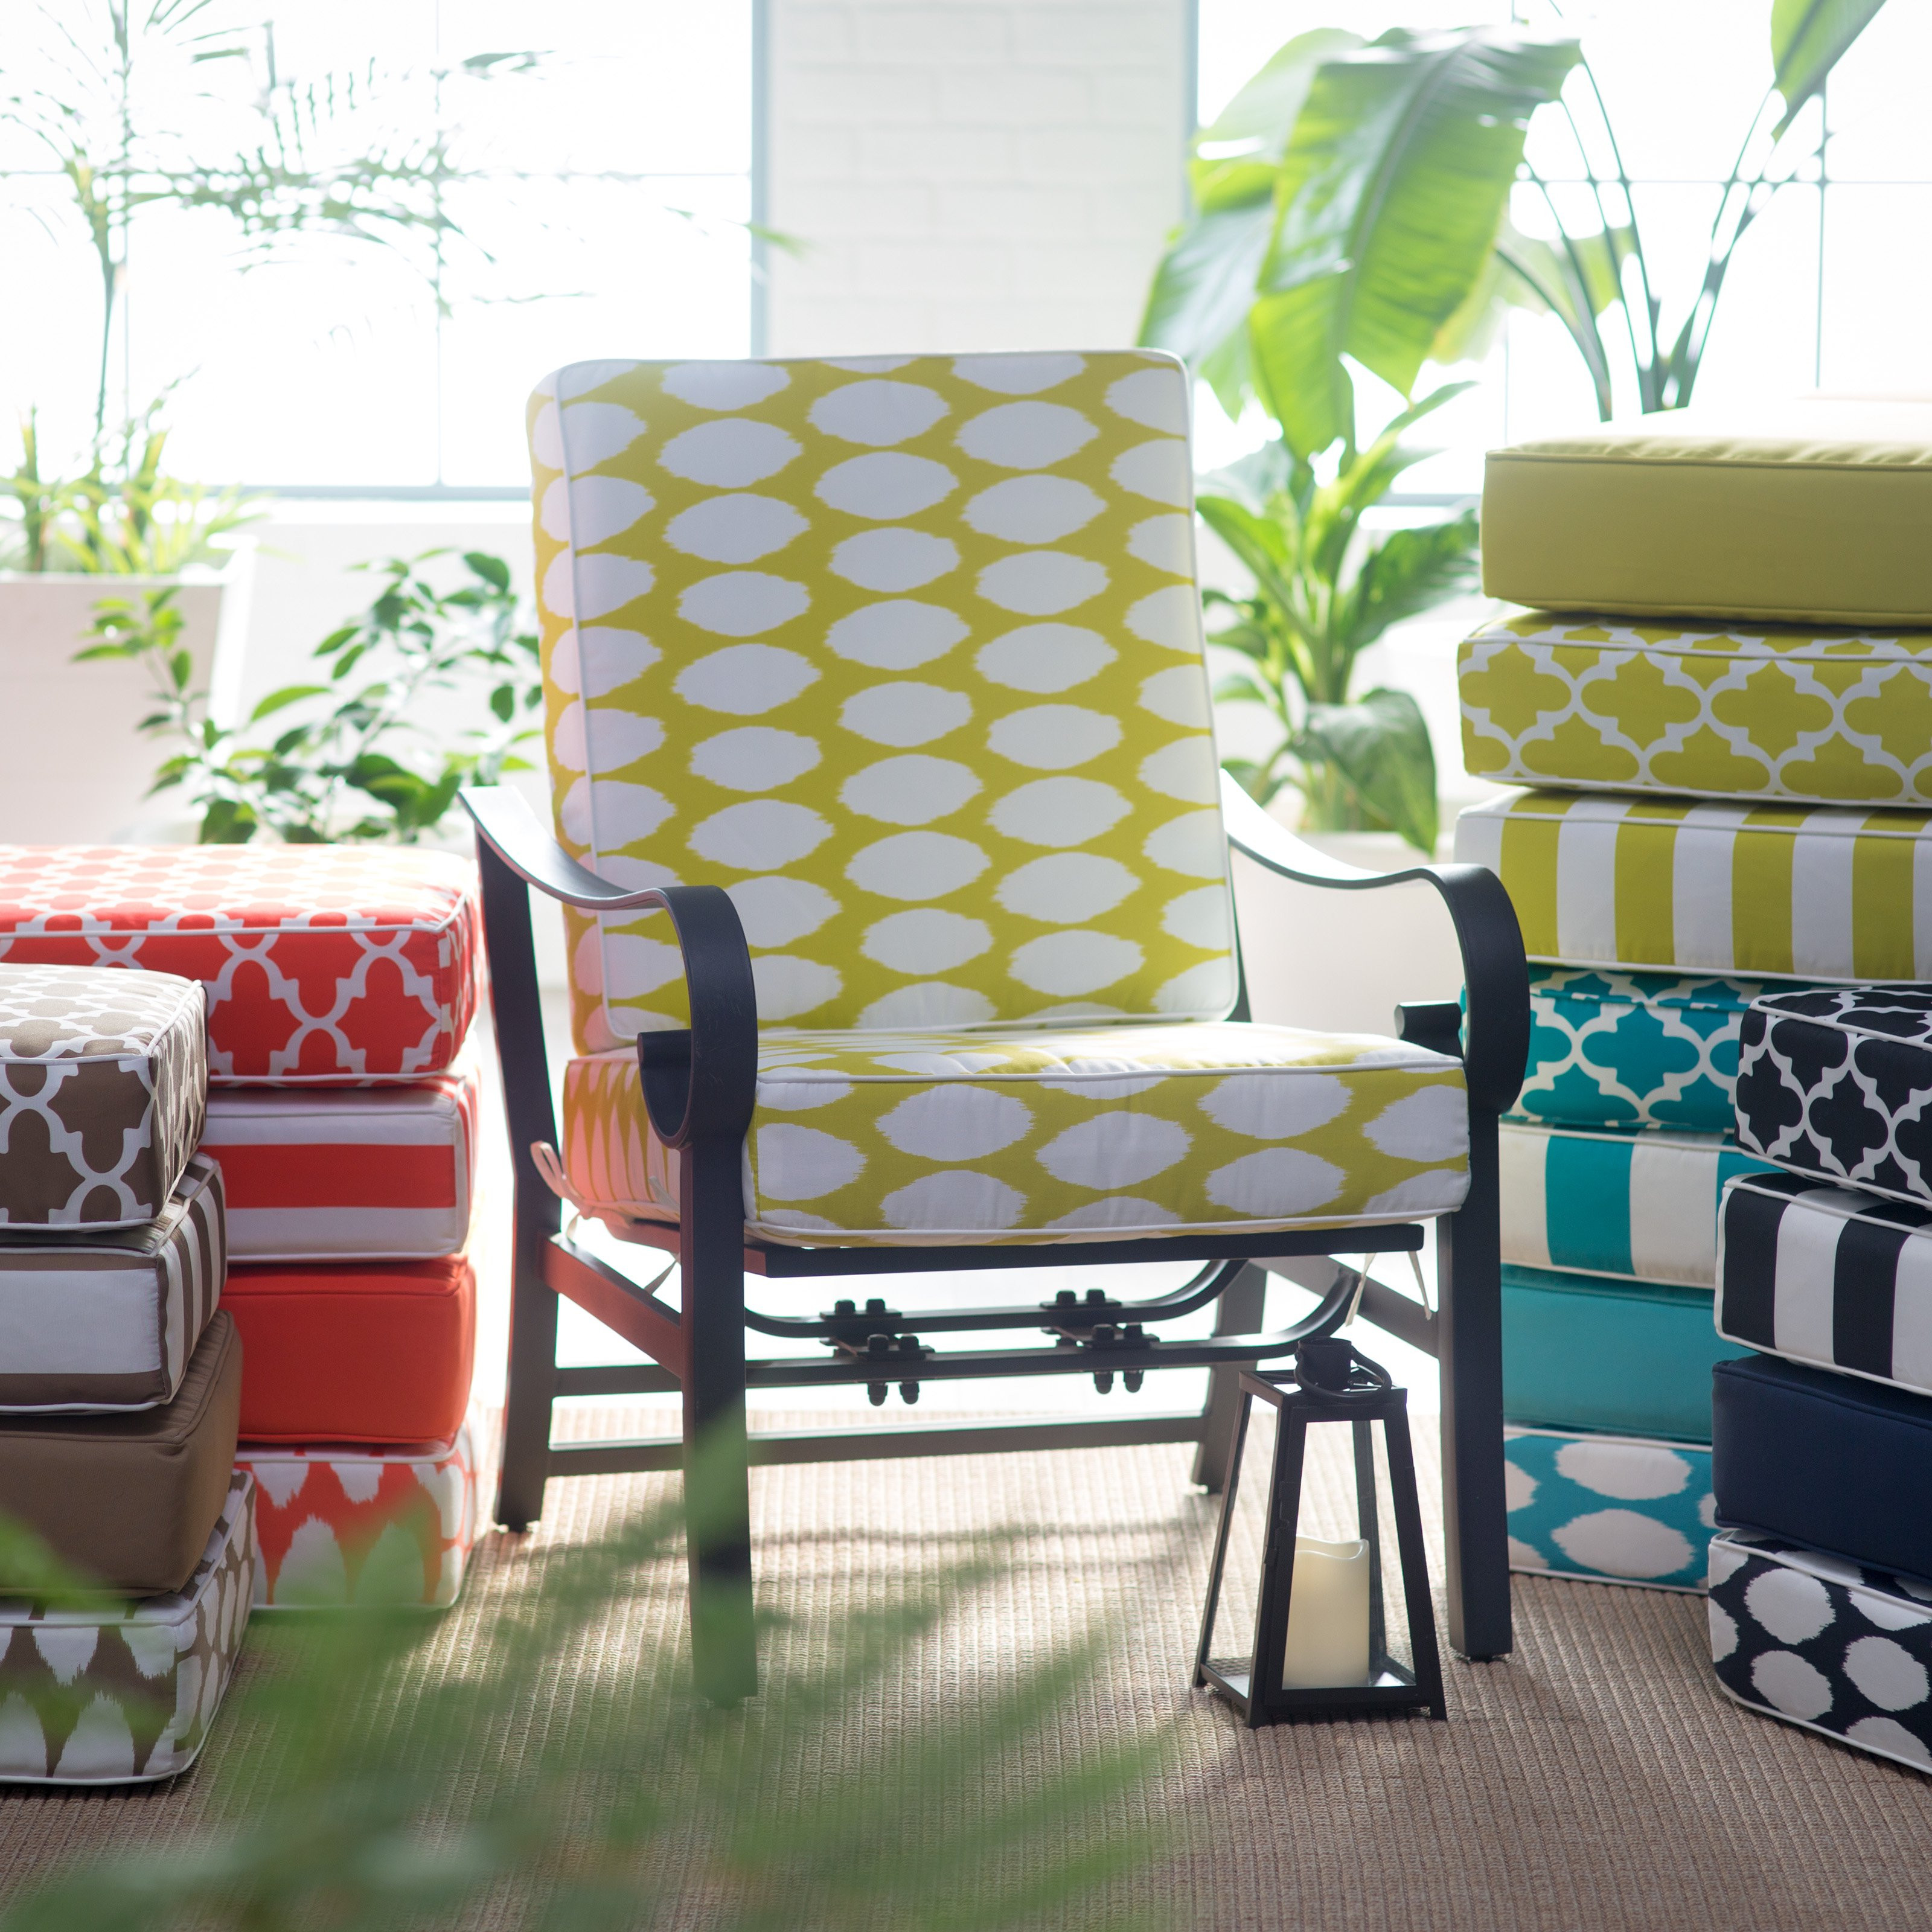 Best ideas about Patio Furniture Cushion Covers . Save or Pin Patio Furniture Cushions Covers Minimalist pixelmari Now.